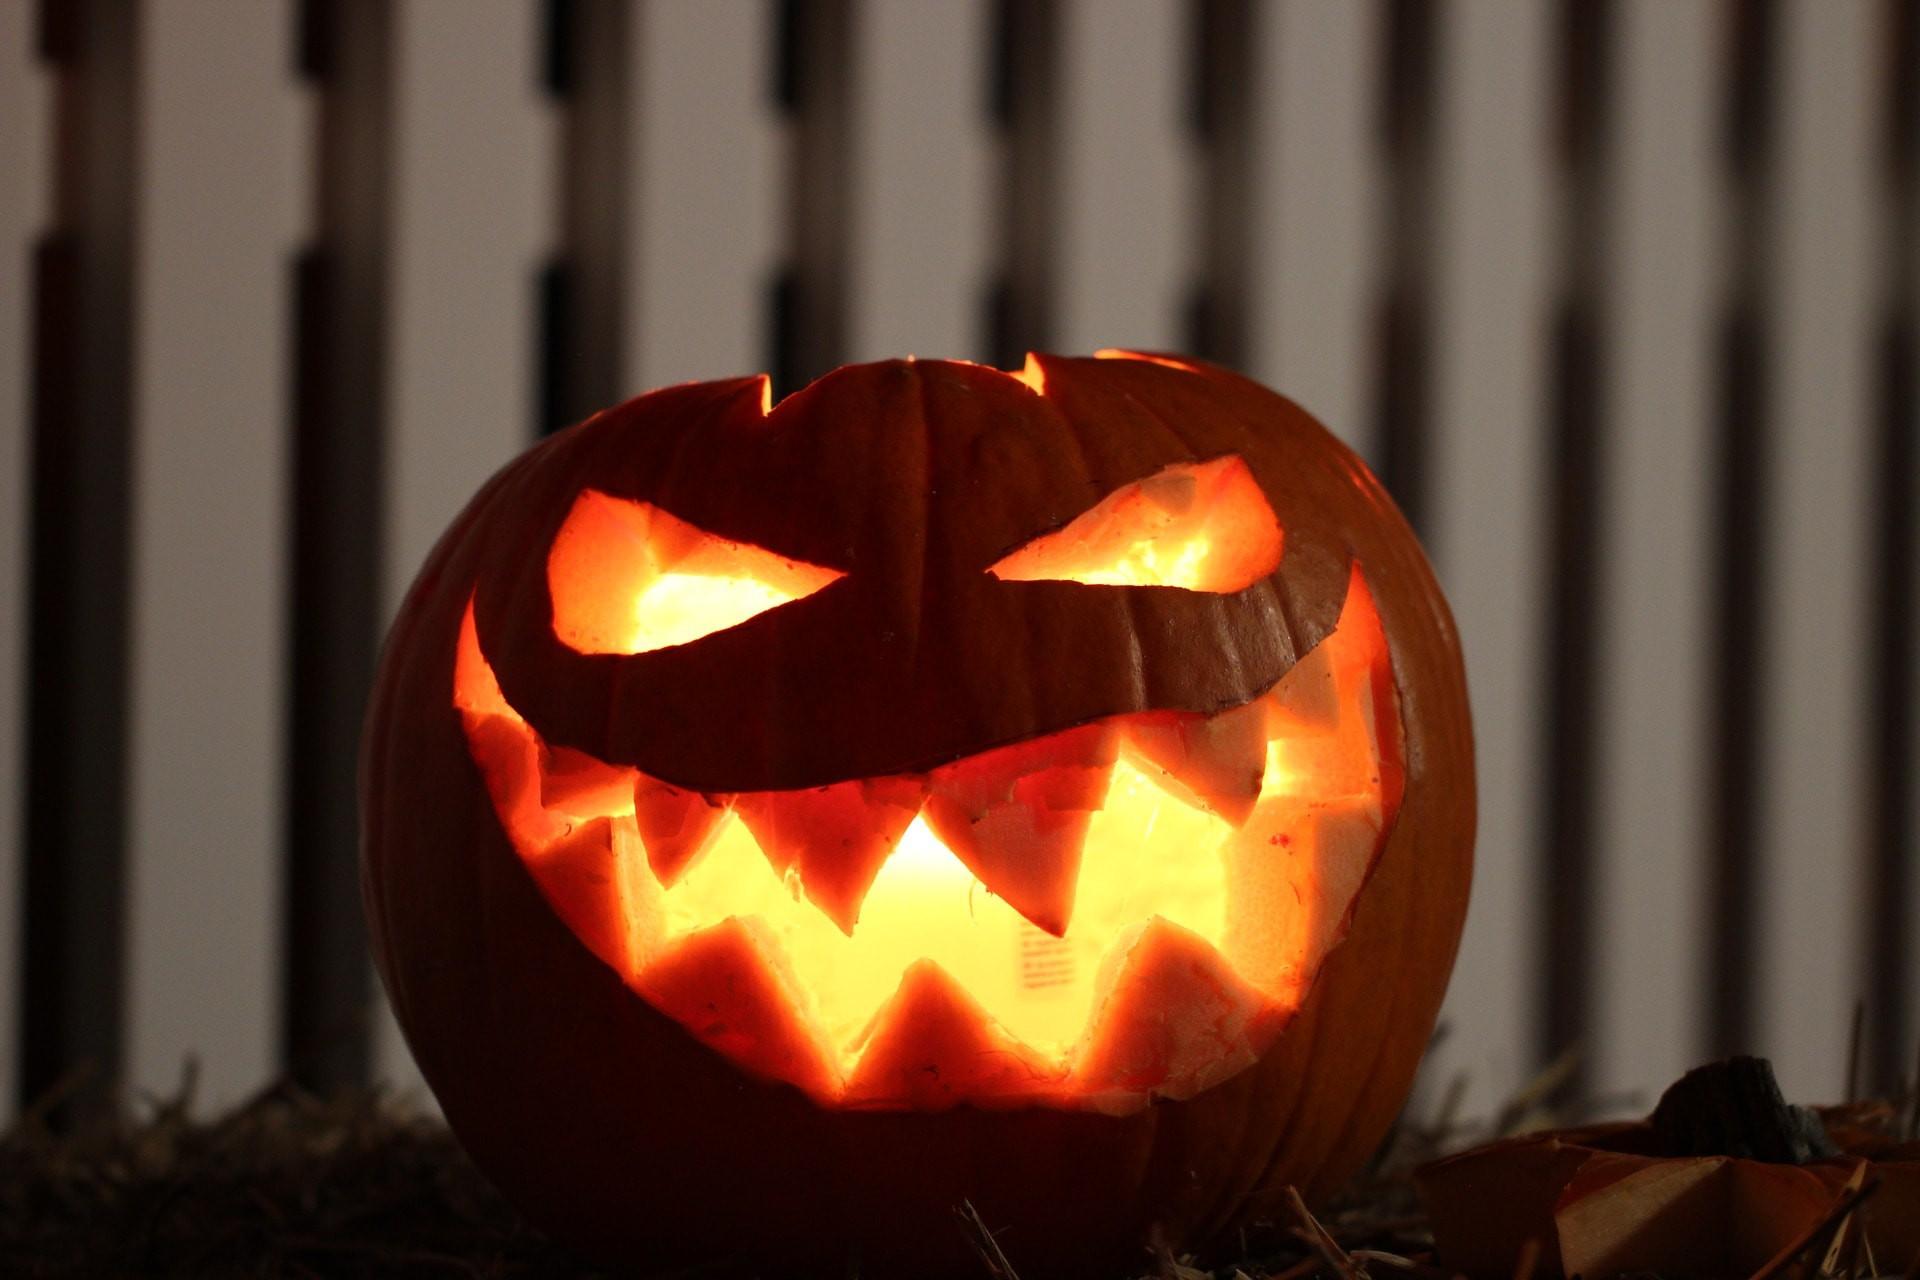 Halloween Utrecht 31 Oktober.15 Reasons To Visit The Netherlands Over Fall